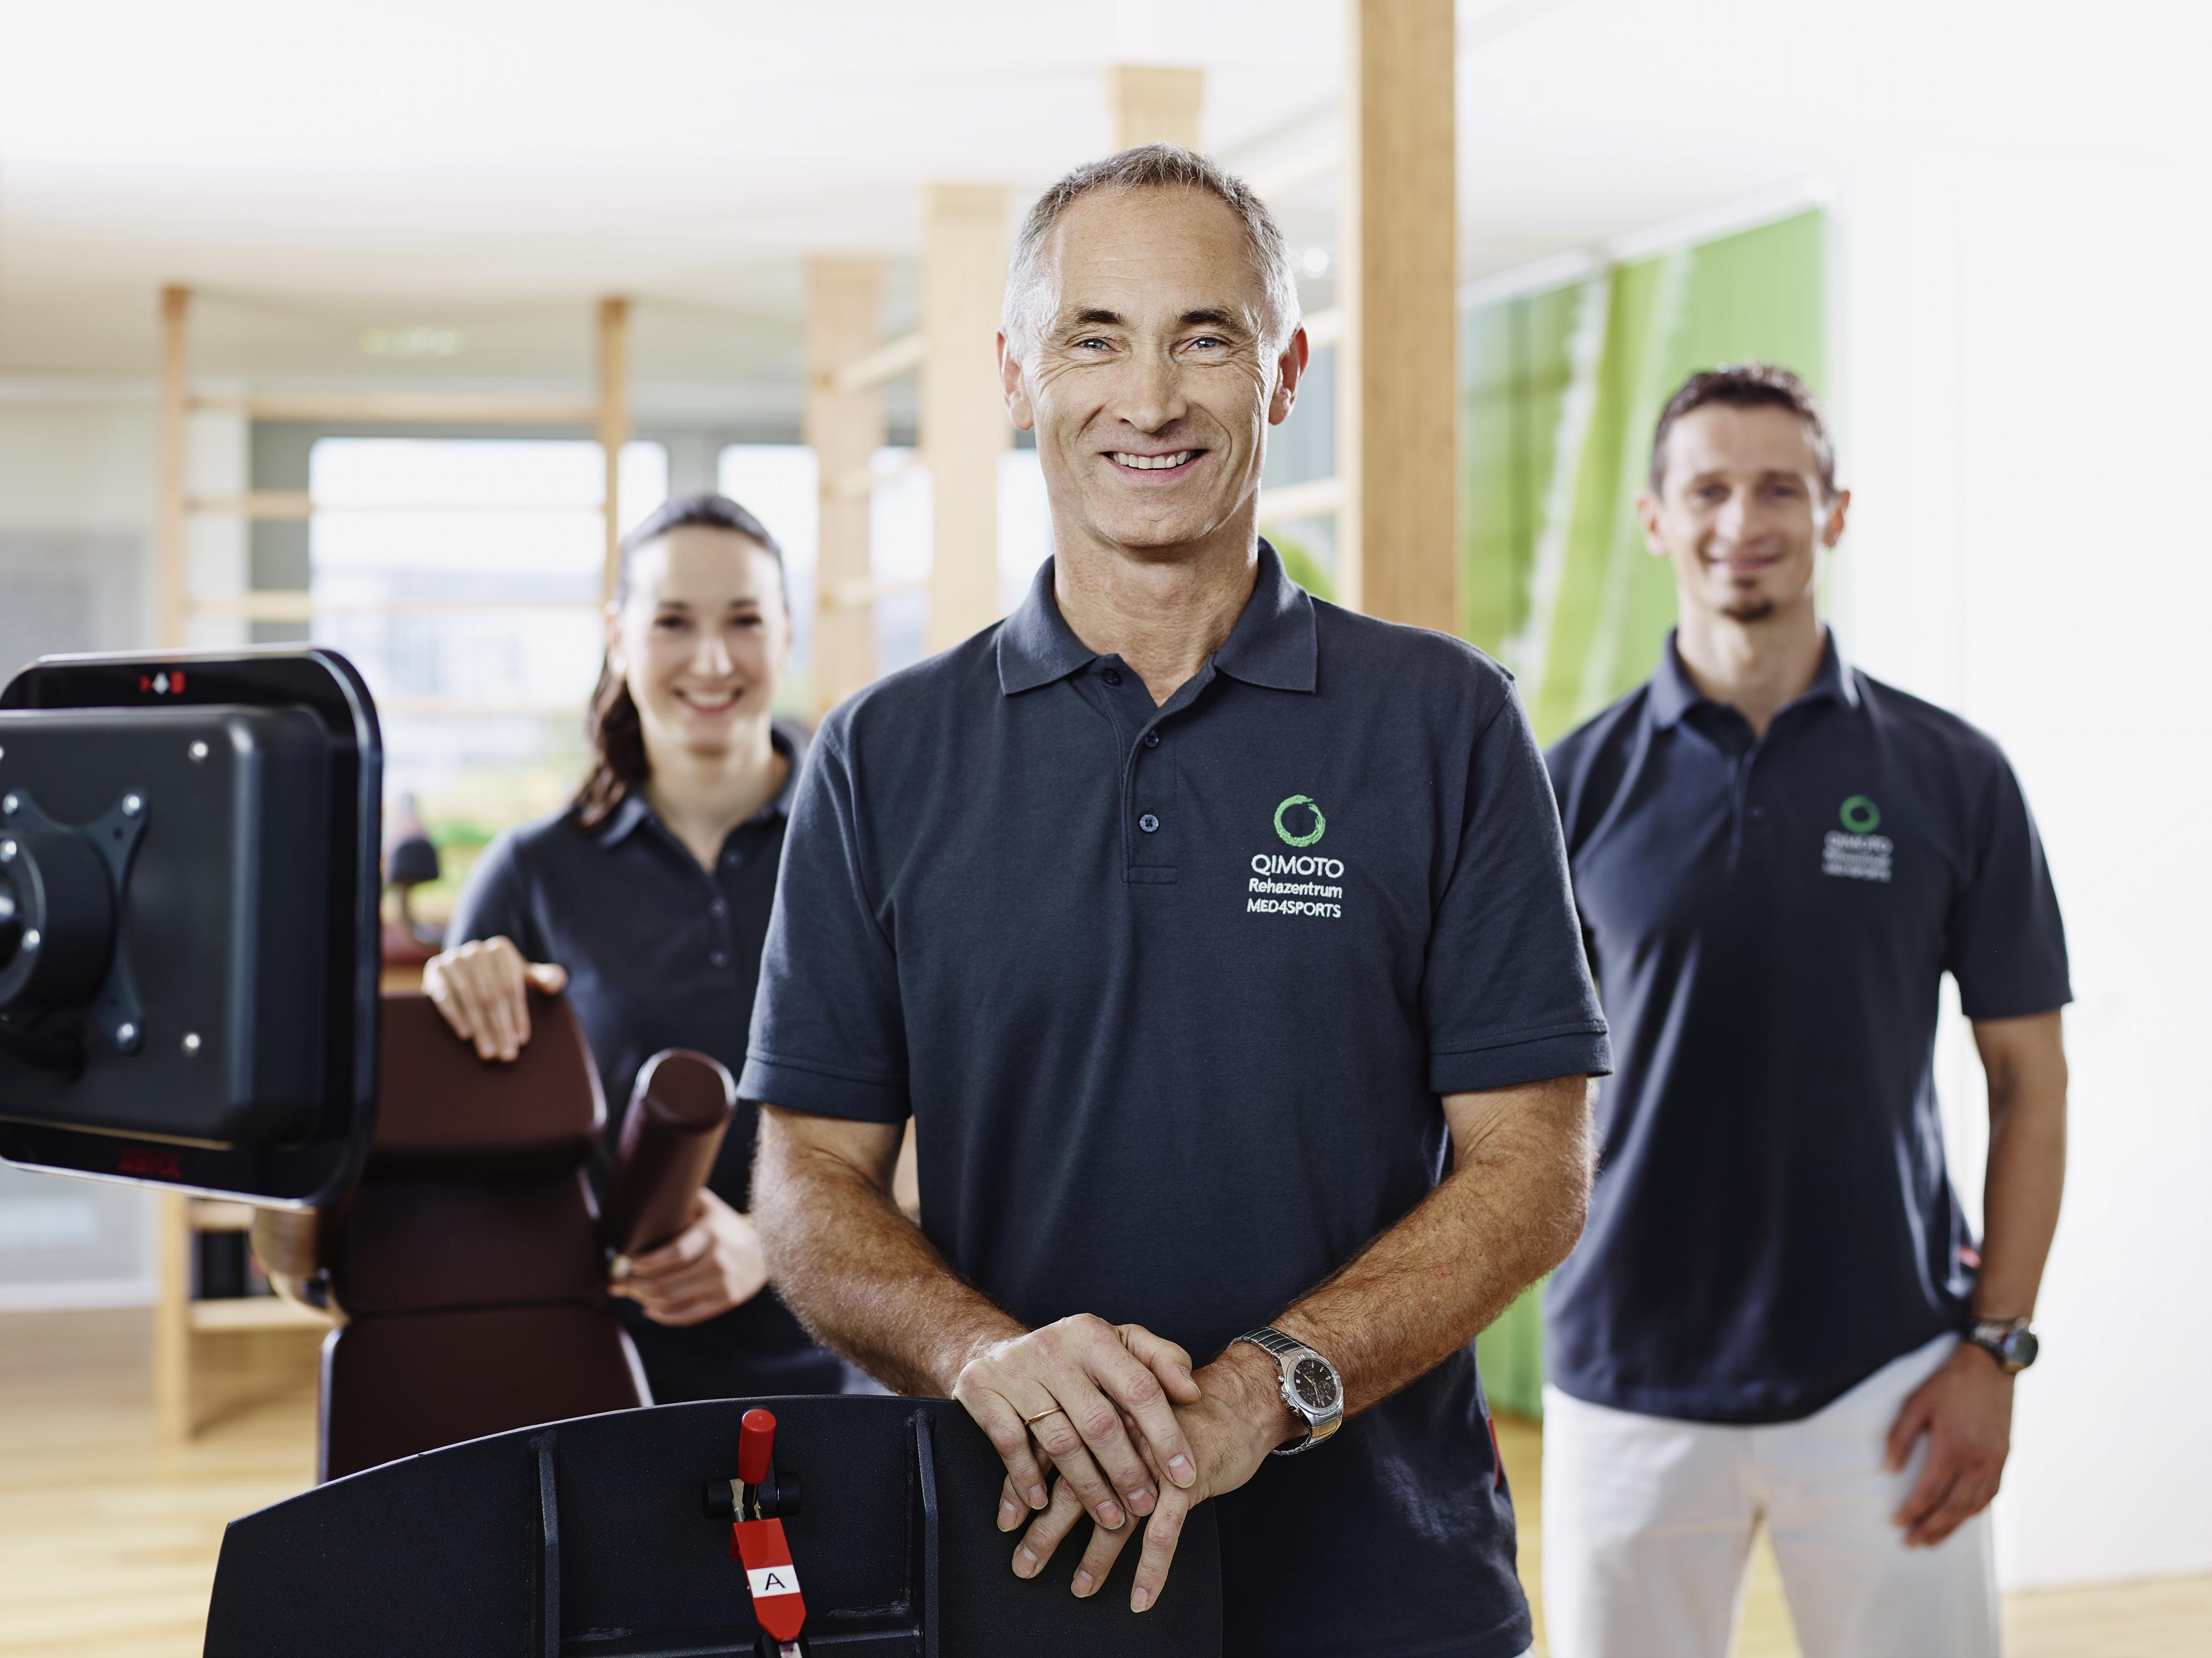 MED4SPORTS Rehazentrum & Health Club